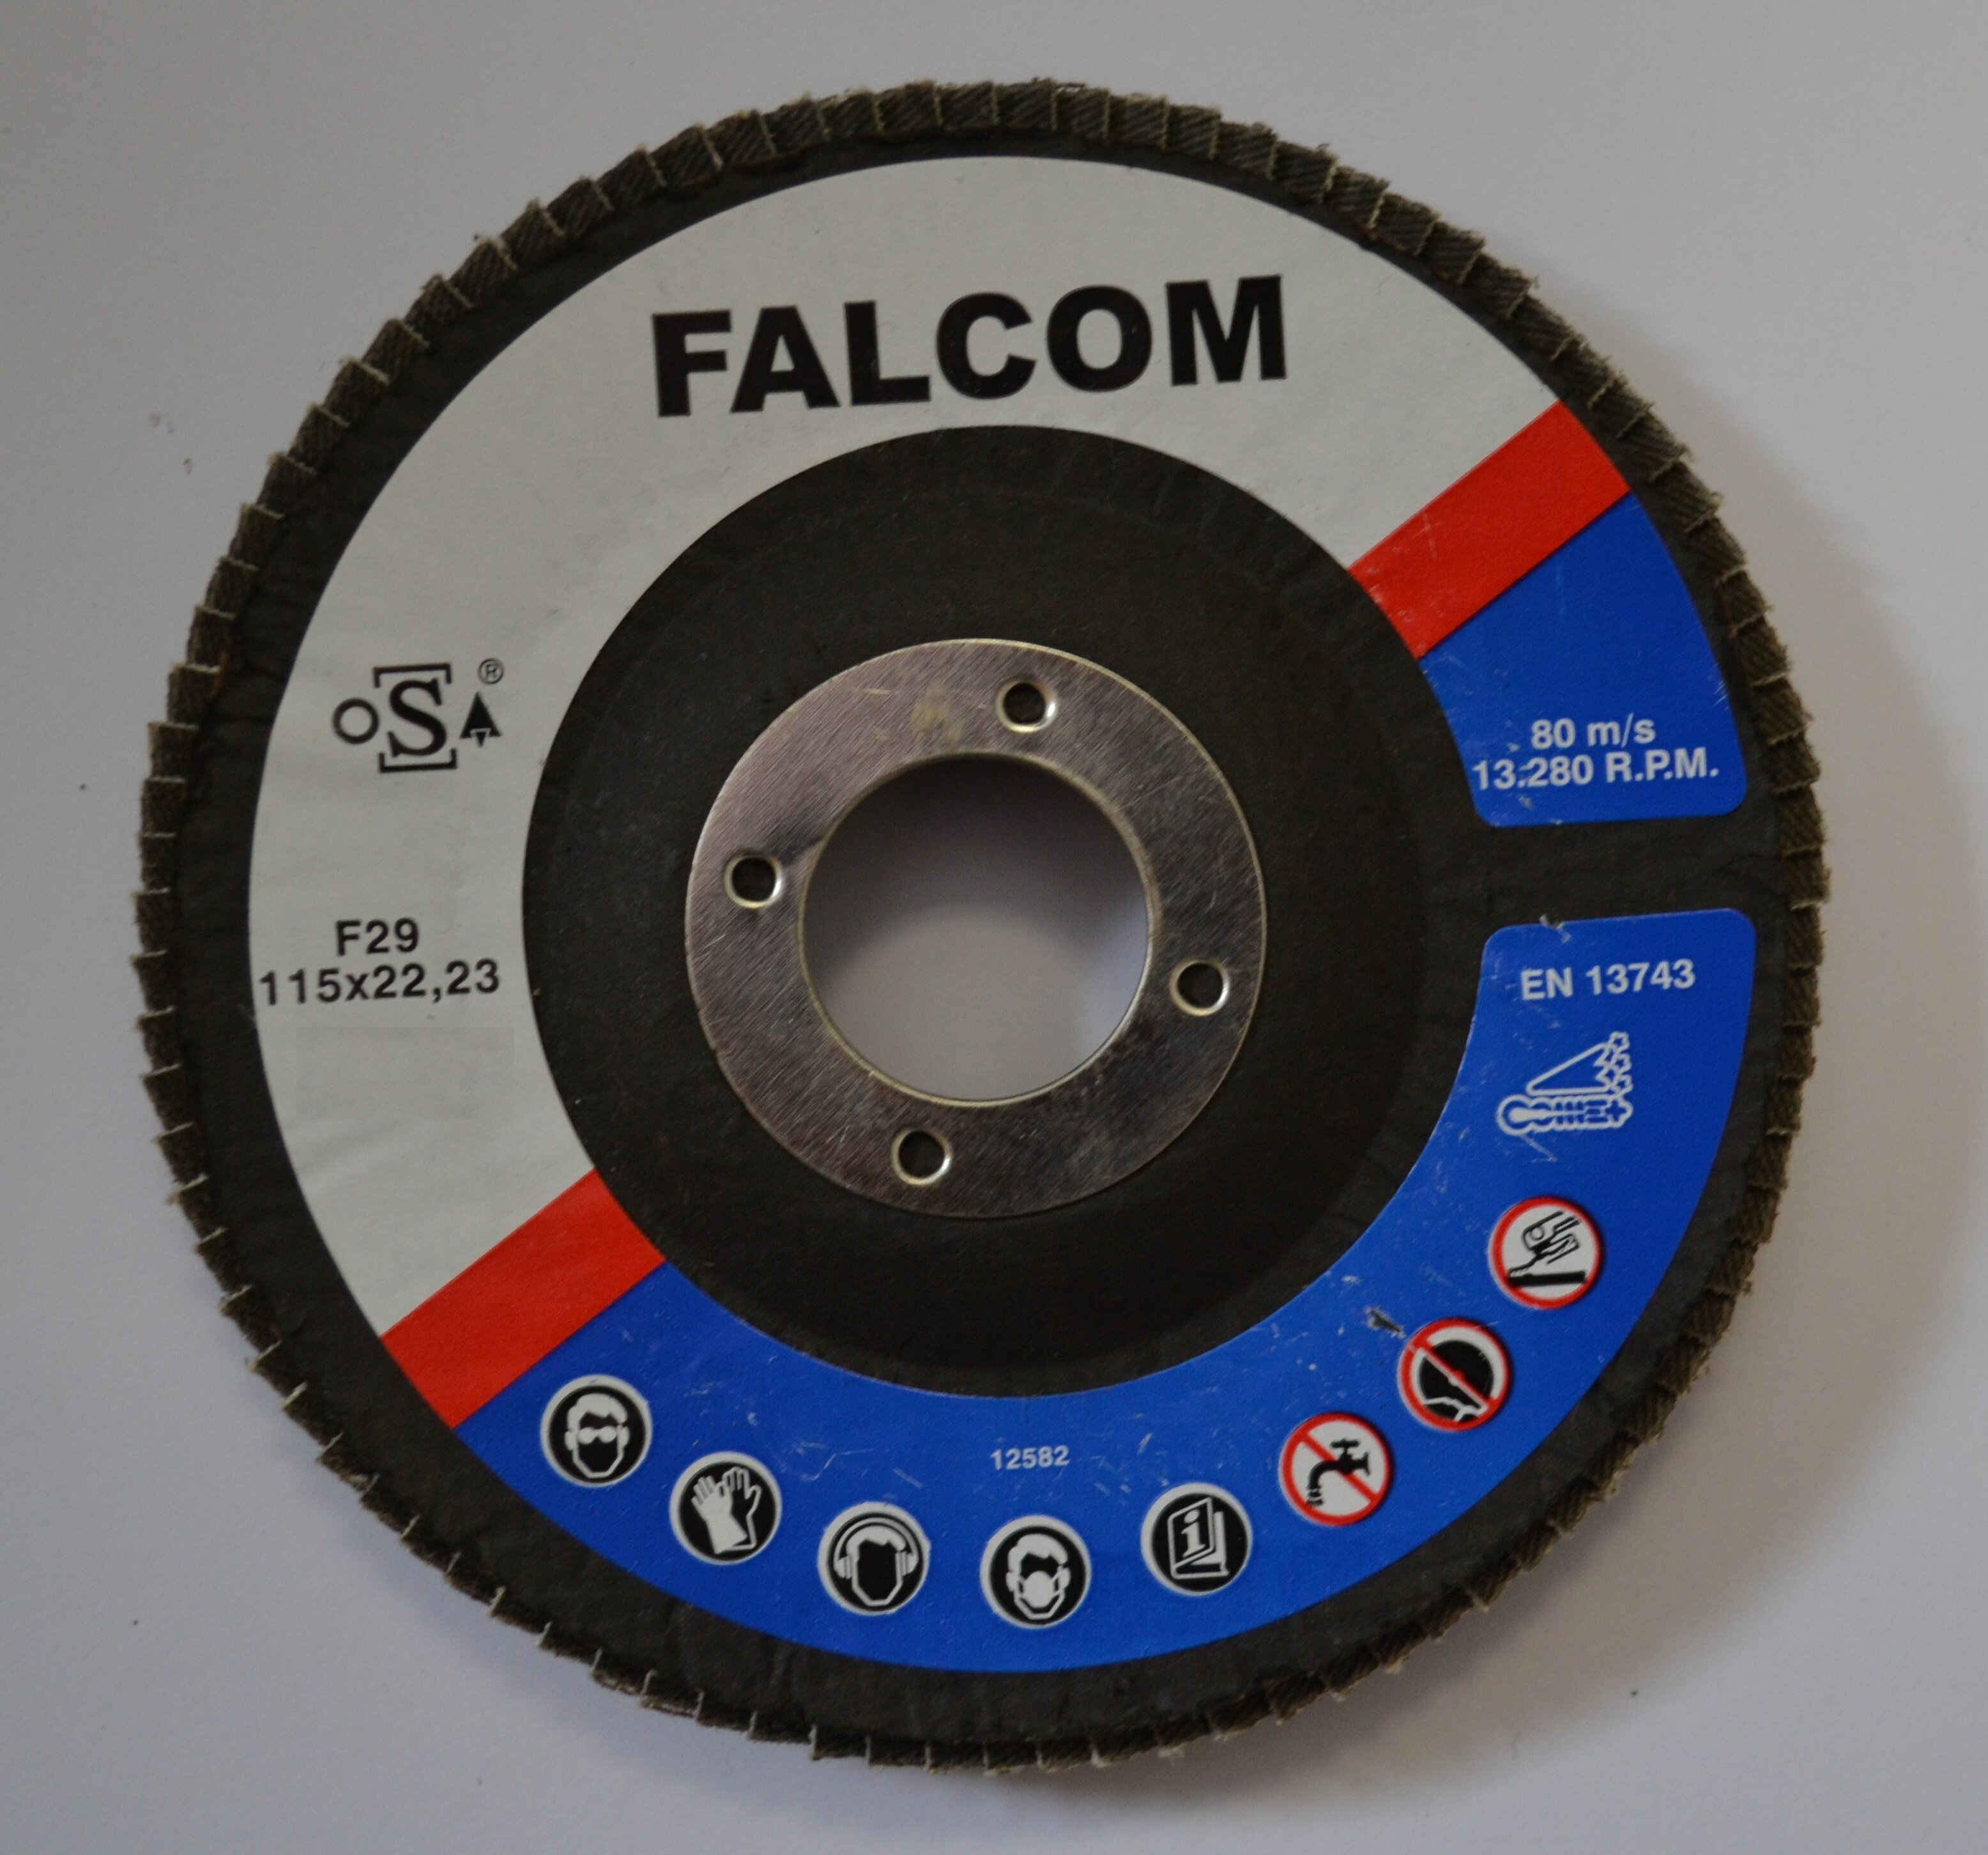 FALCOM 115x22mm GRIT 80 MOP DISC